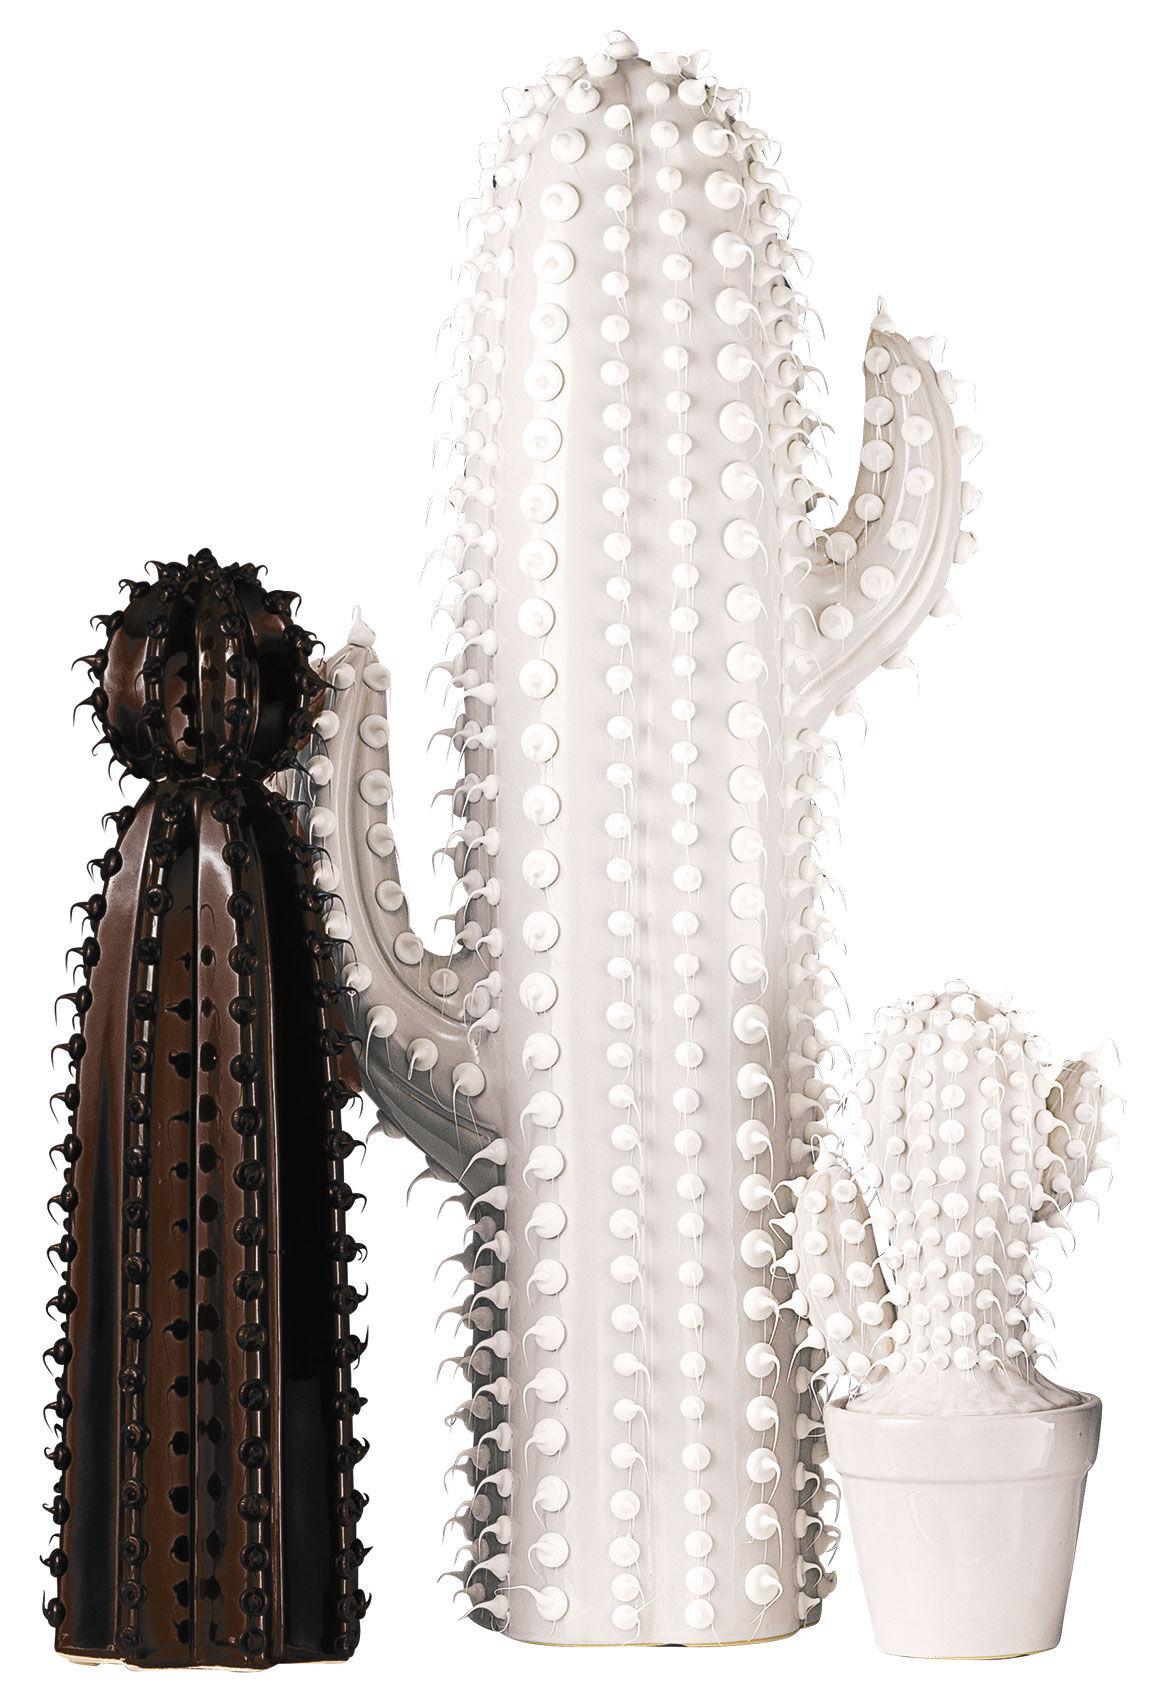 deko objekt kaktus schwarz ars mundi. Black Bedroom Furniture Sets. Home Design Ideas